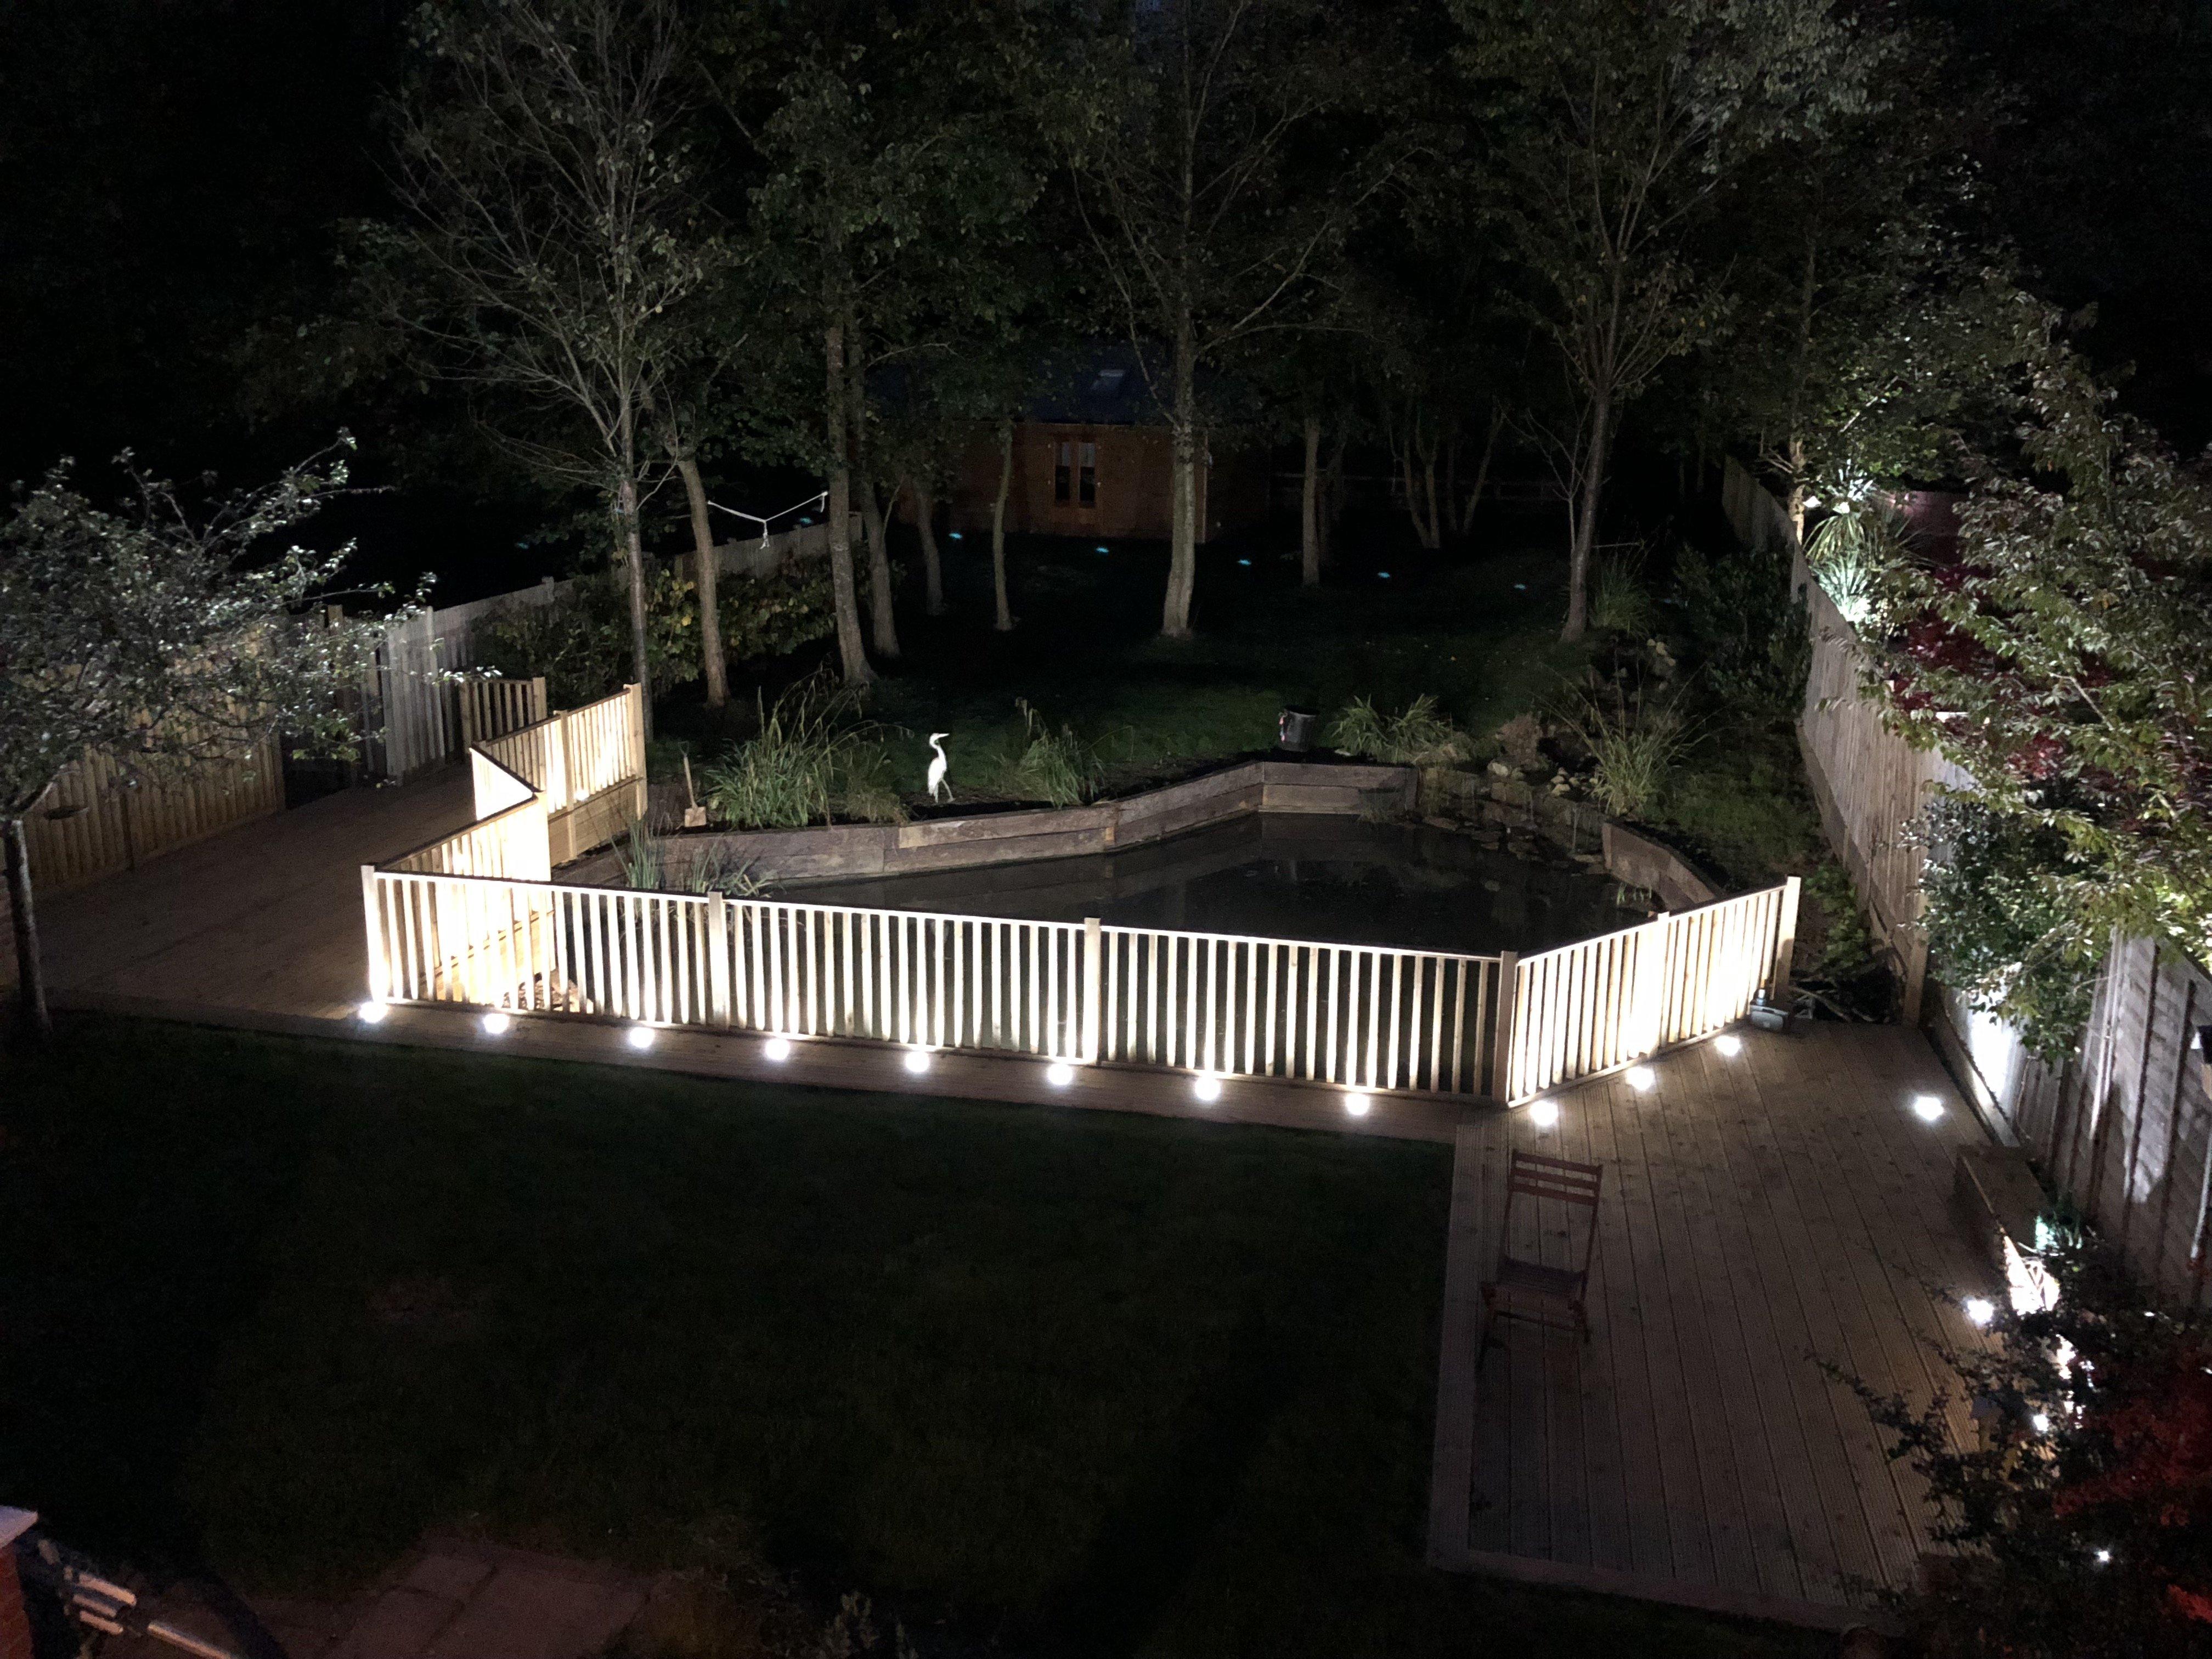 Landscaping & Paving - Homewood Build